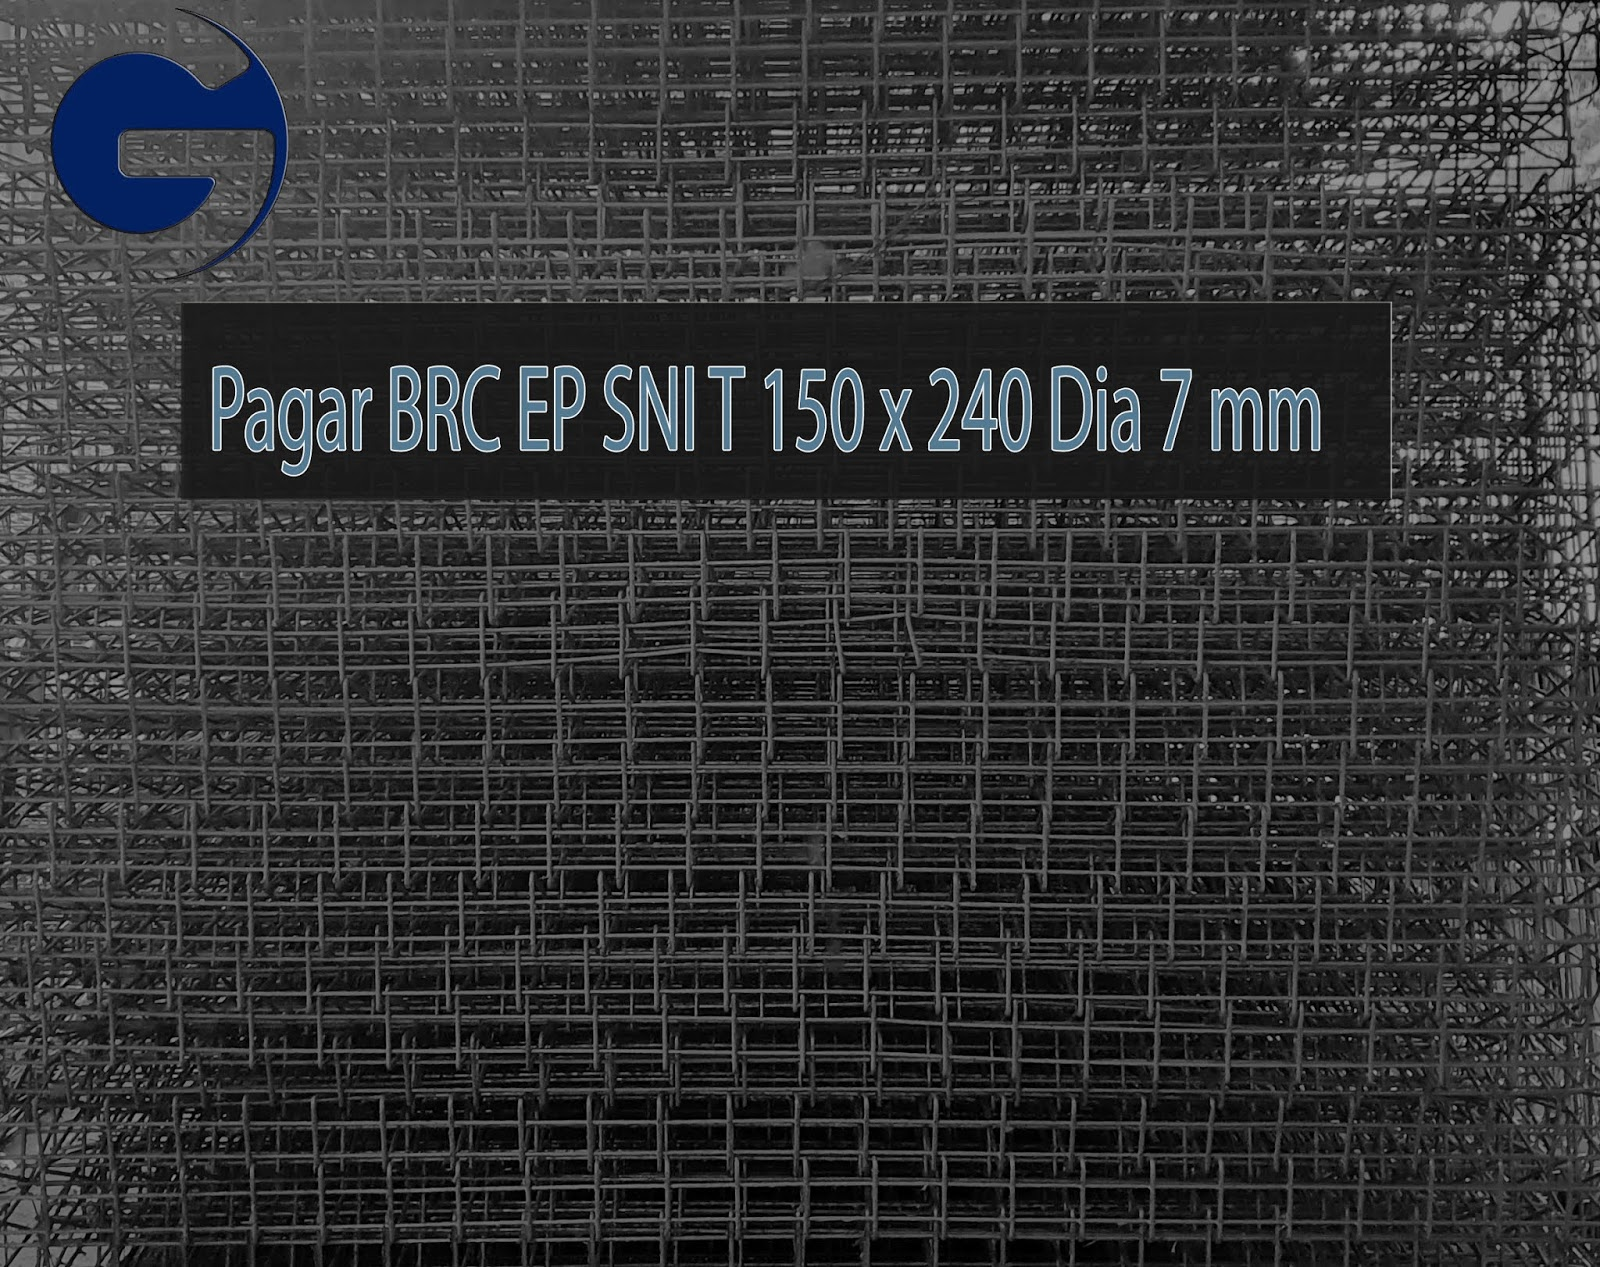 Jual Pagar BRC EP SNI T 150 x 240 Dia 7 mm